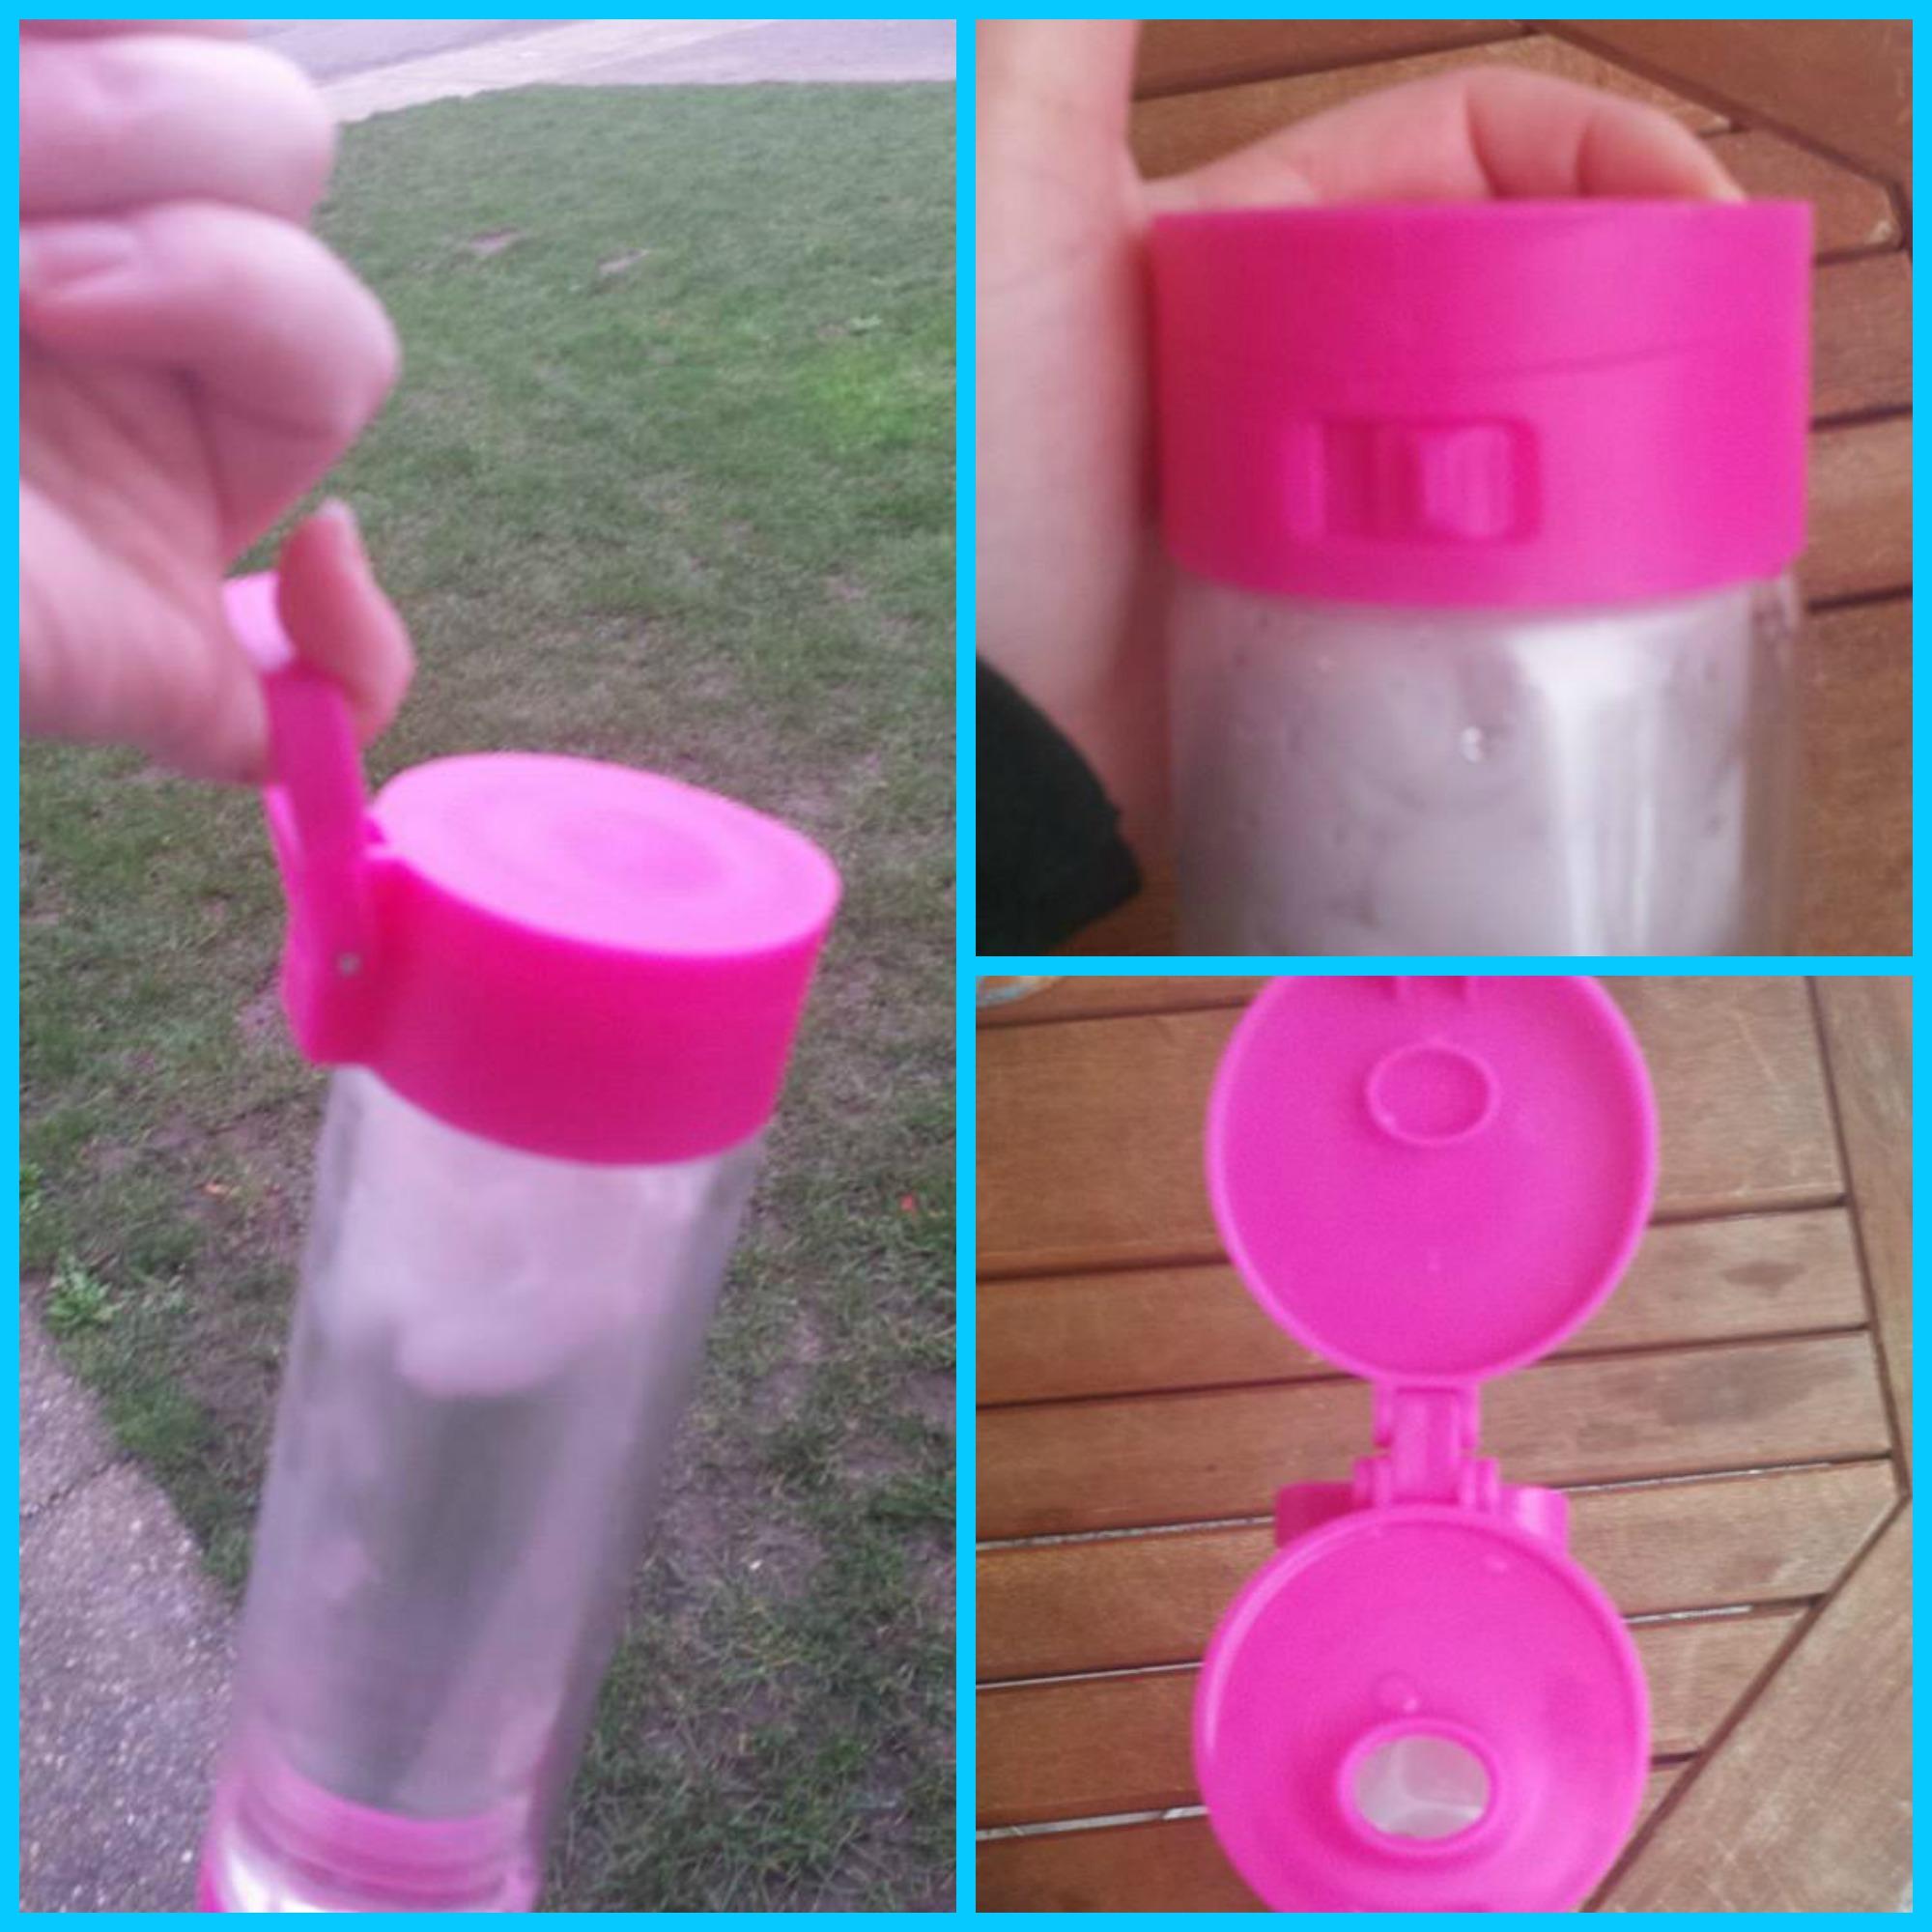 Glasstic Shatterproof Glass Water Bottle 3 Pack Giveaway Ends 2/18